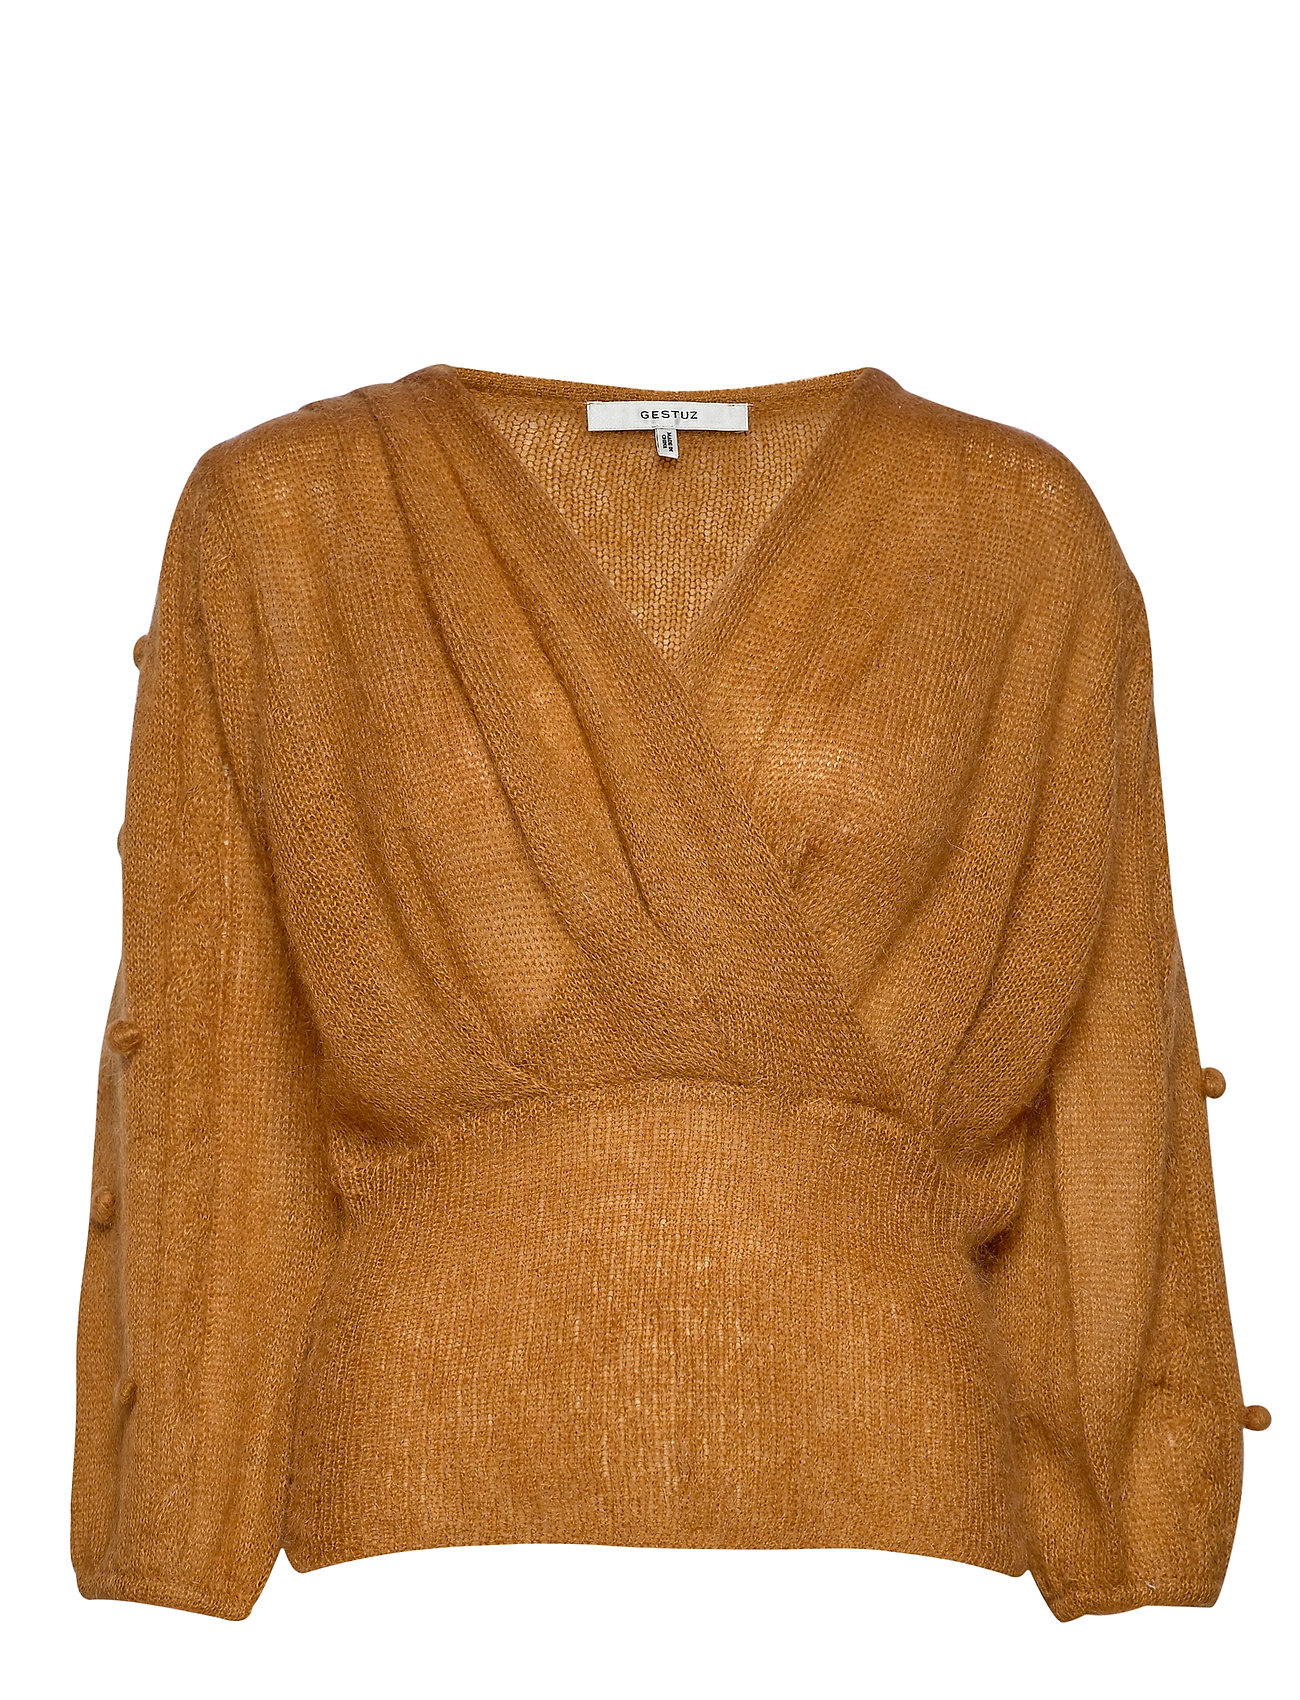 Gestuz JaylaGZ pullover SO20 - BONE BROWN